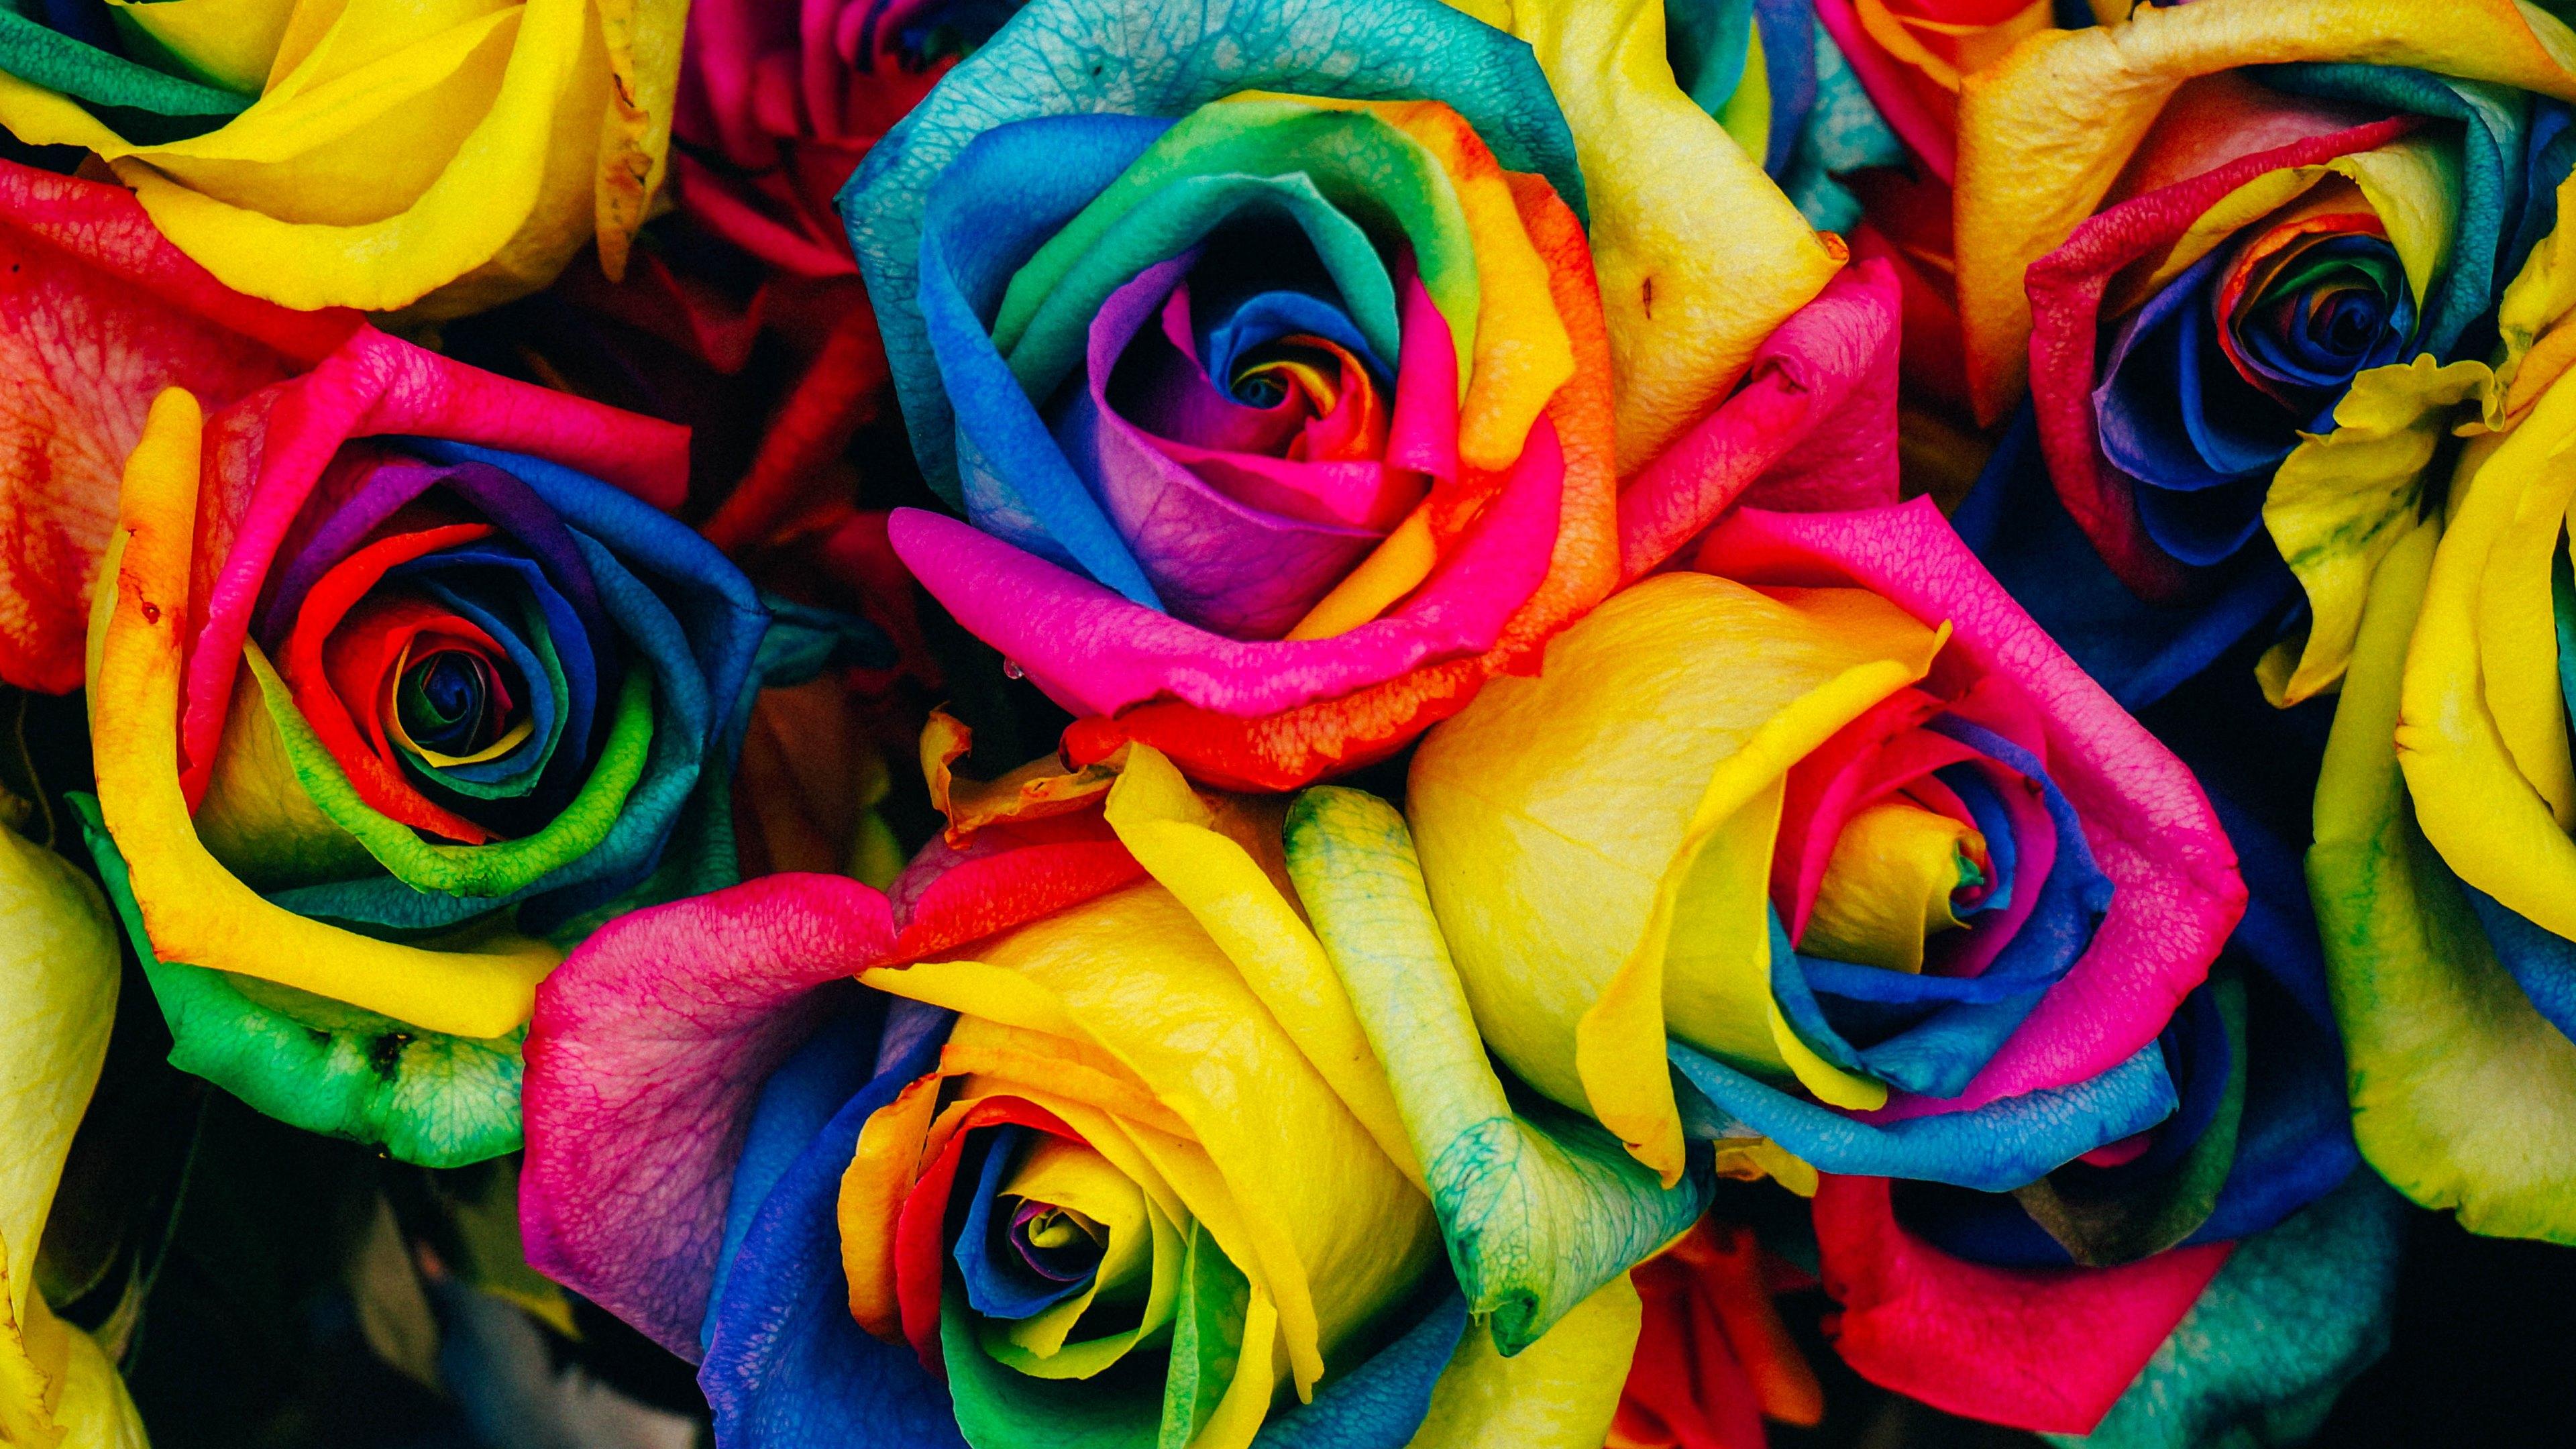 Hd wallpaper rainbow - Wallpaper Rainbow Of Roses Ultra Hd 4k 3840x2160